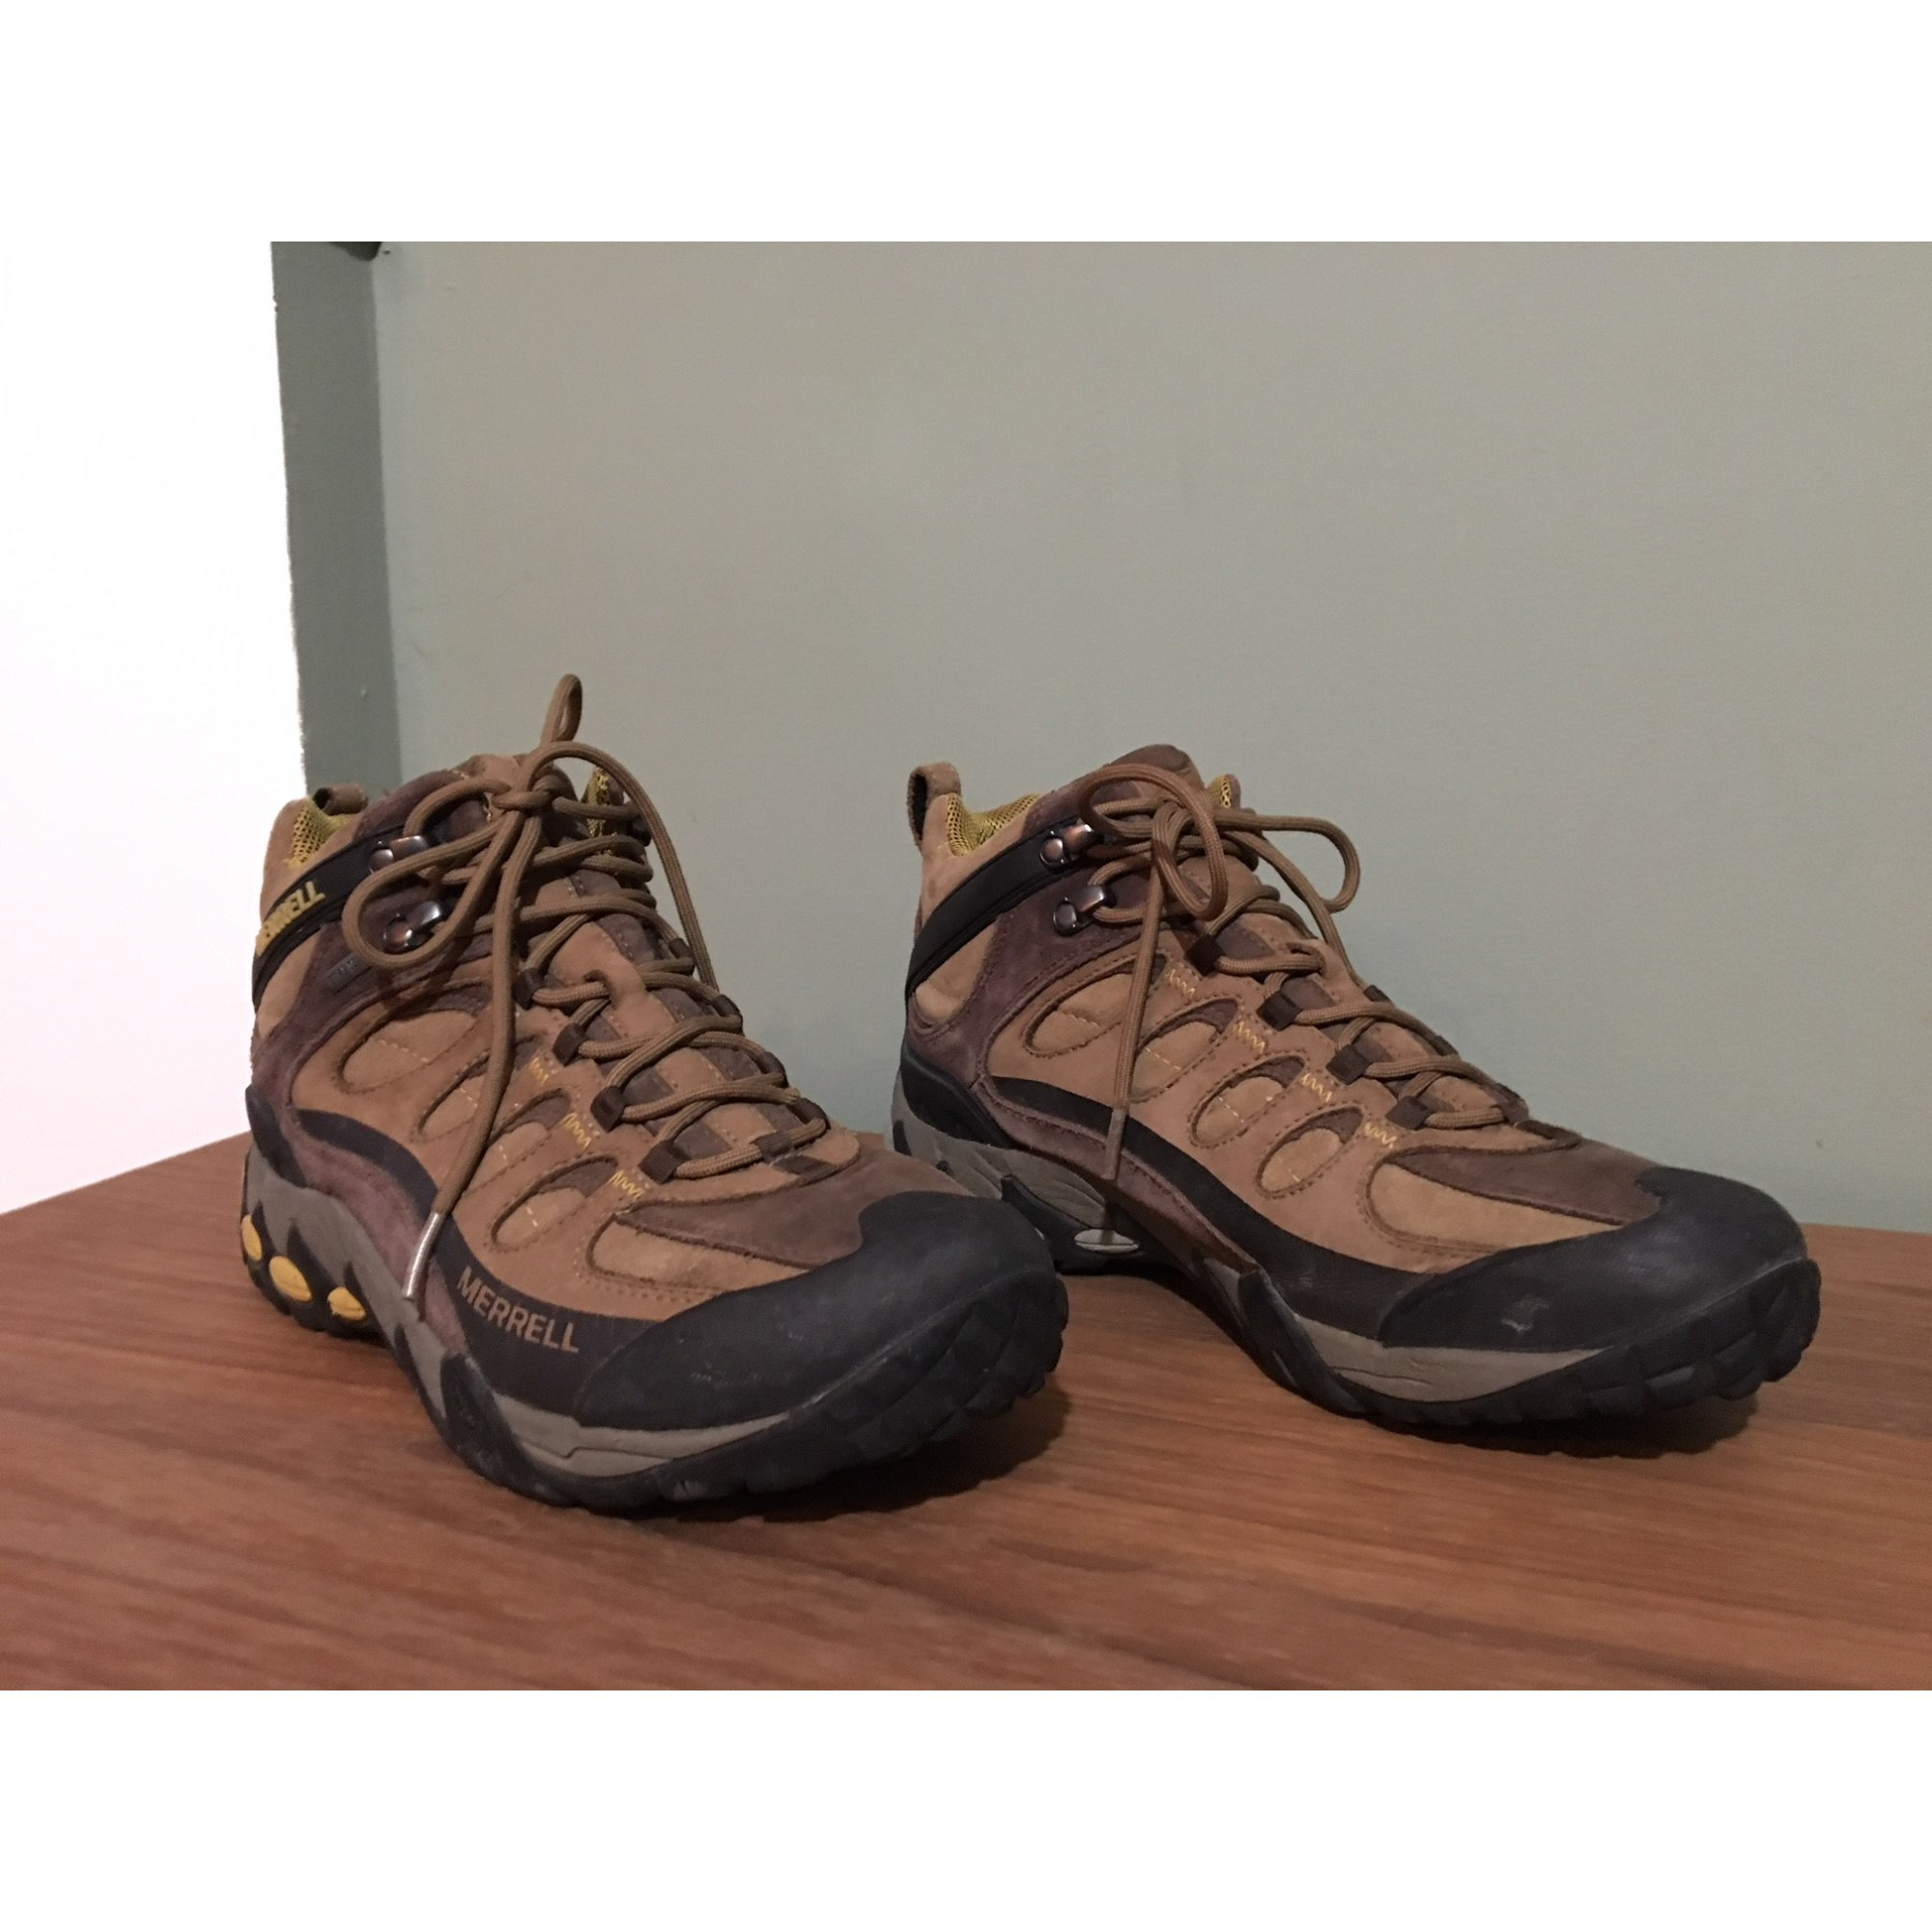 De 42 Chaussures 5 7268645 Marron Merrell Sport dqAxwHZ